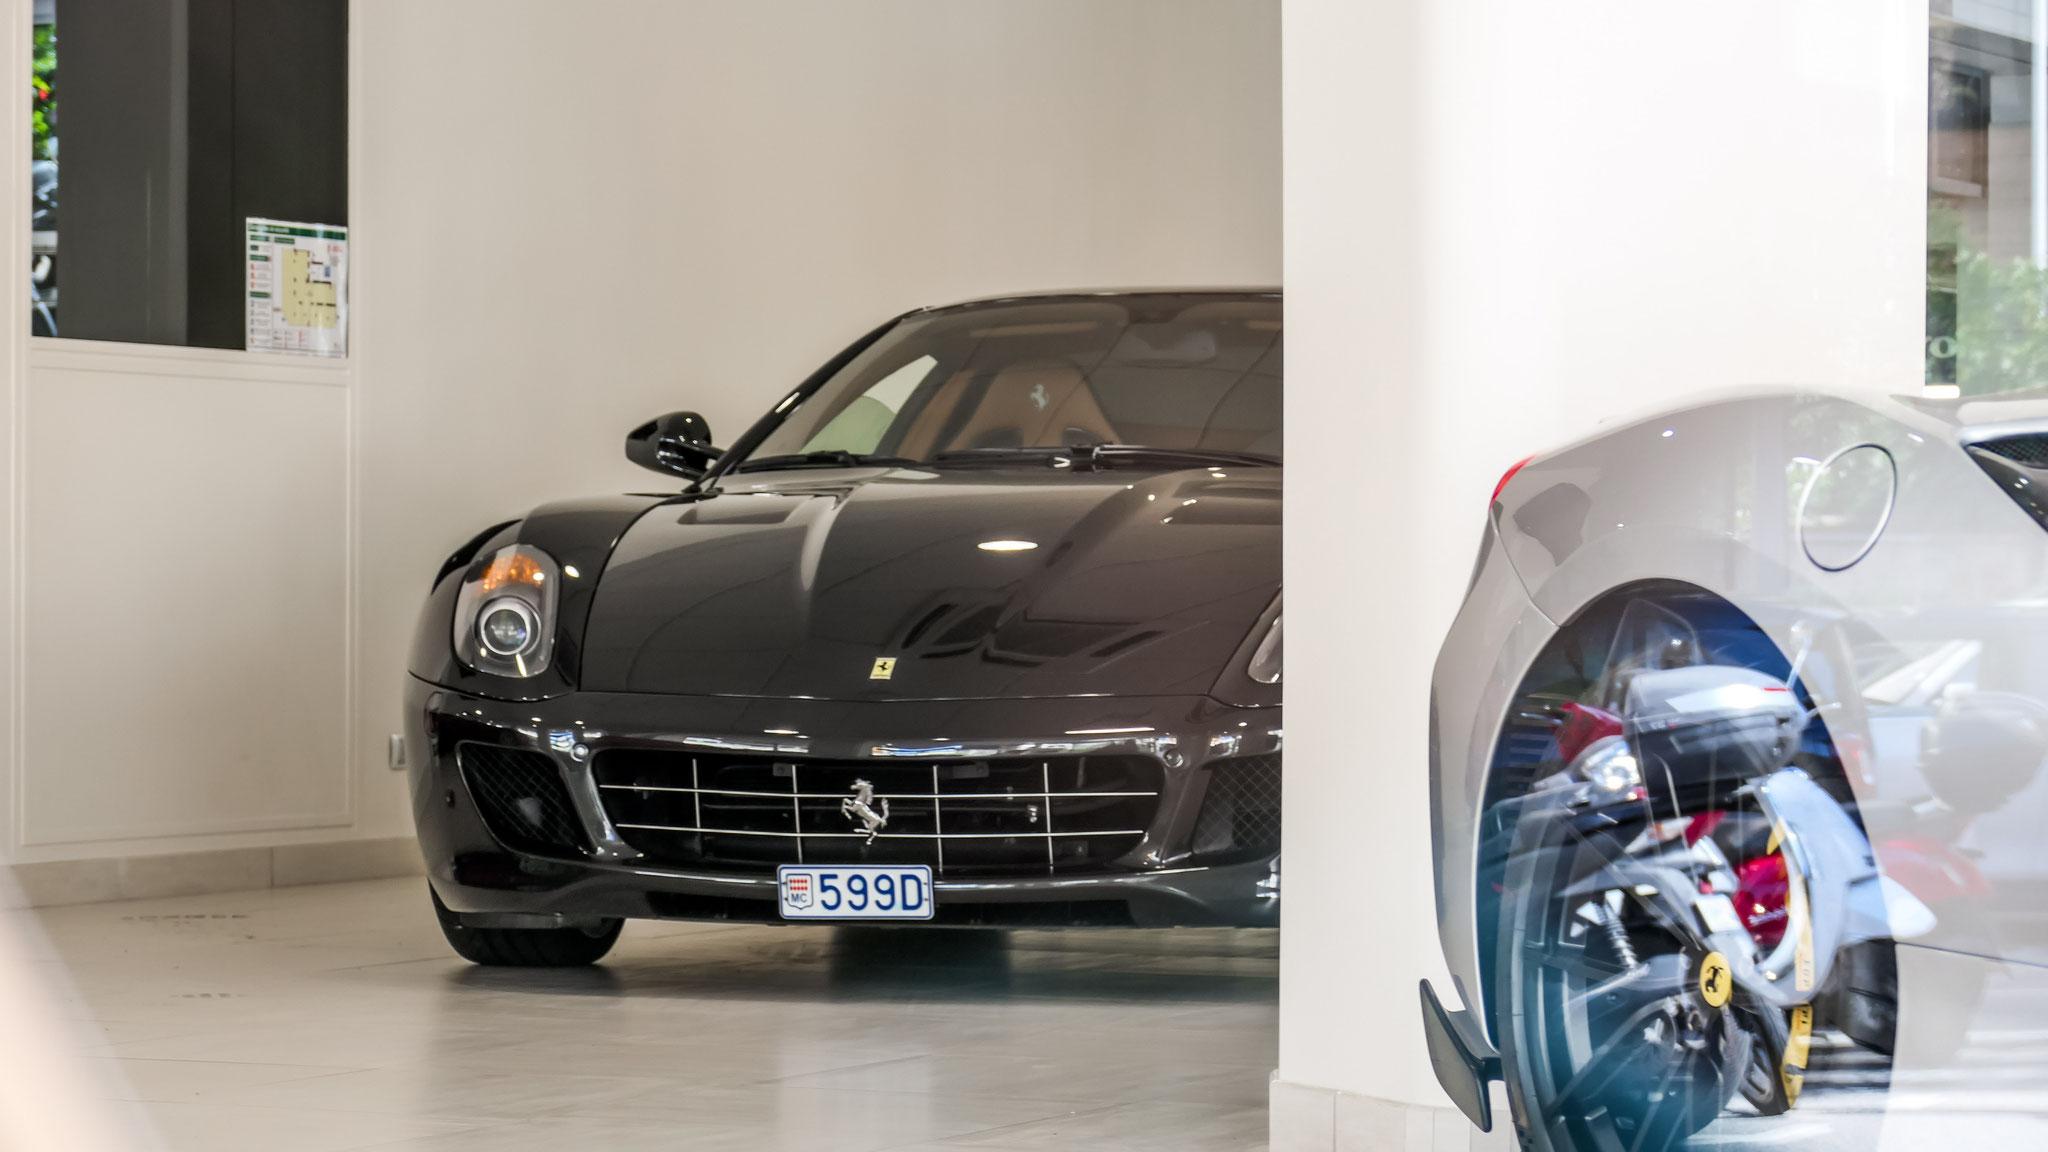 Ferrari 599 GTB - 599D (MC)